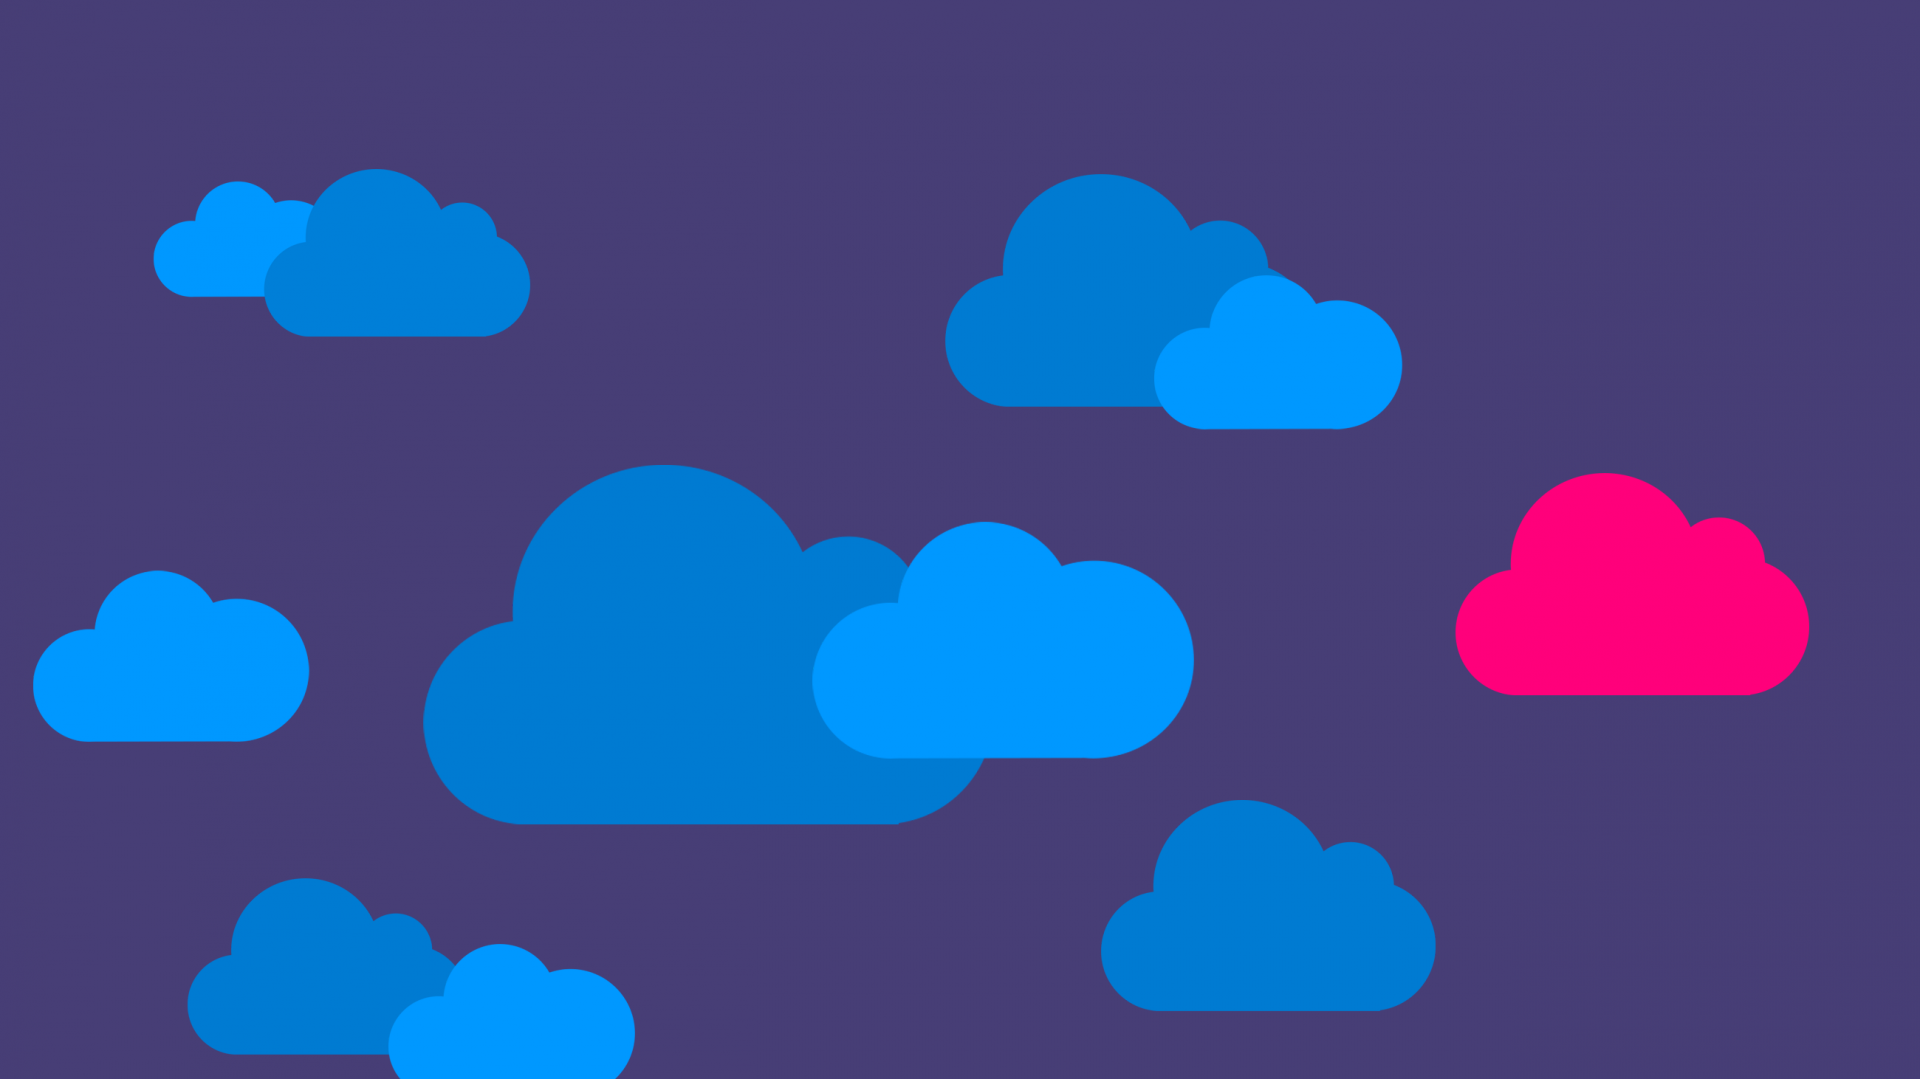 Go Cloud Labs